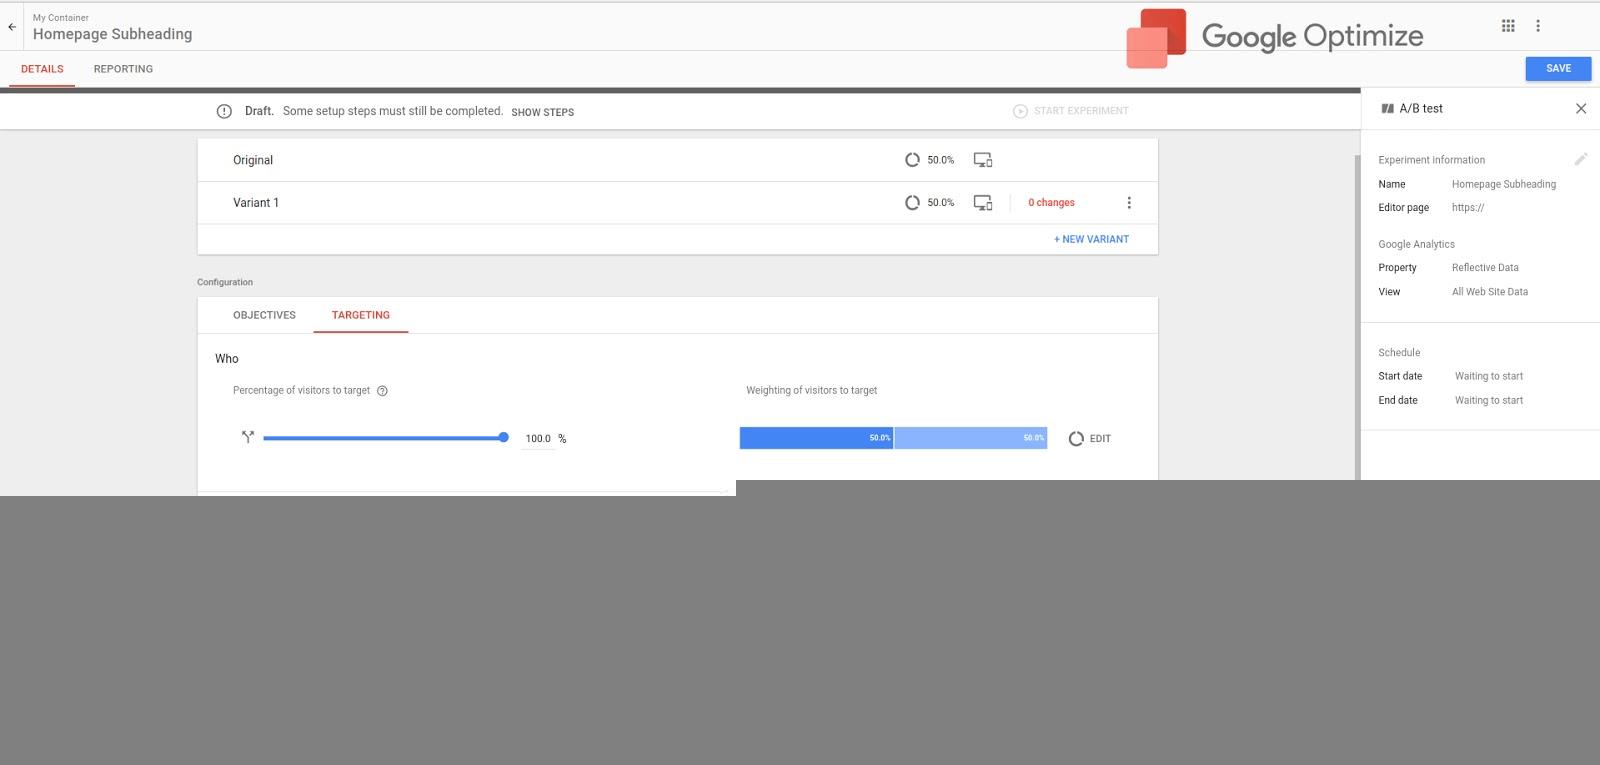 Google Optimize for Churches